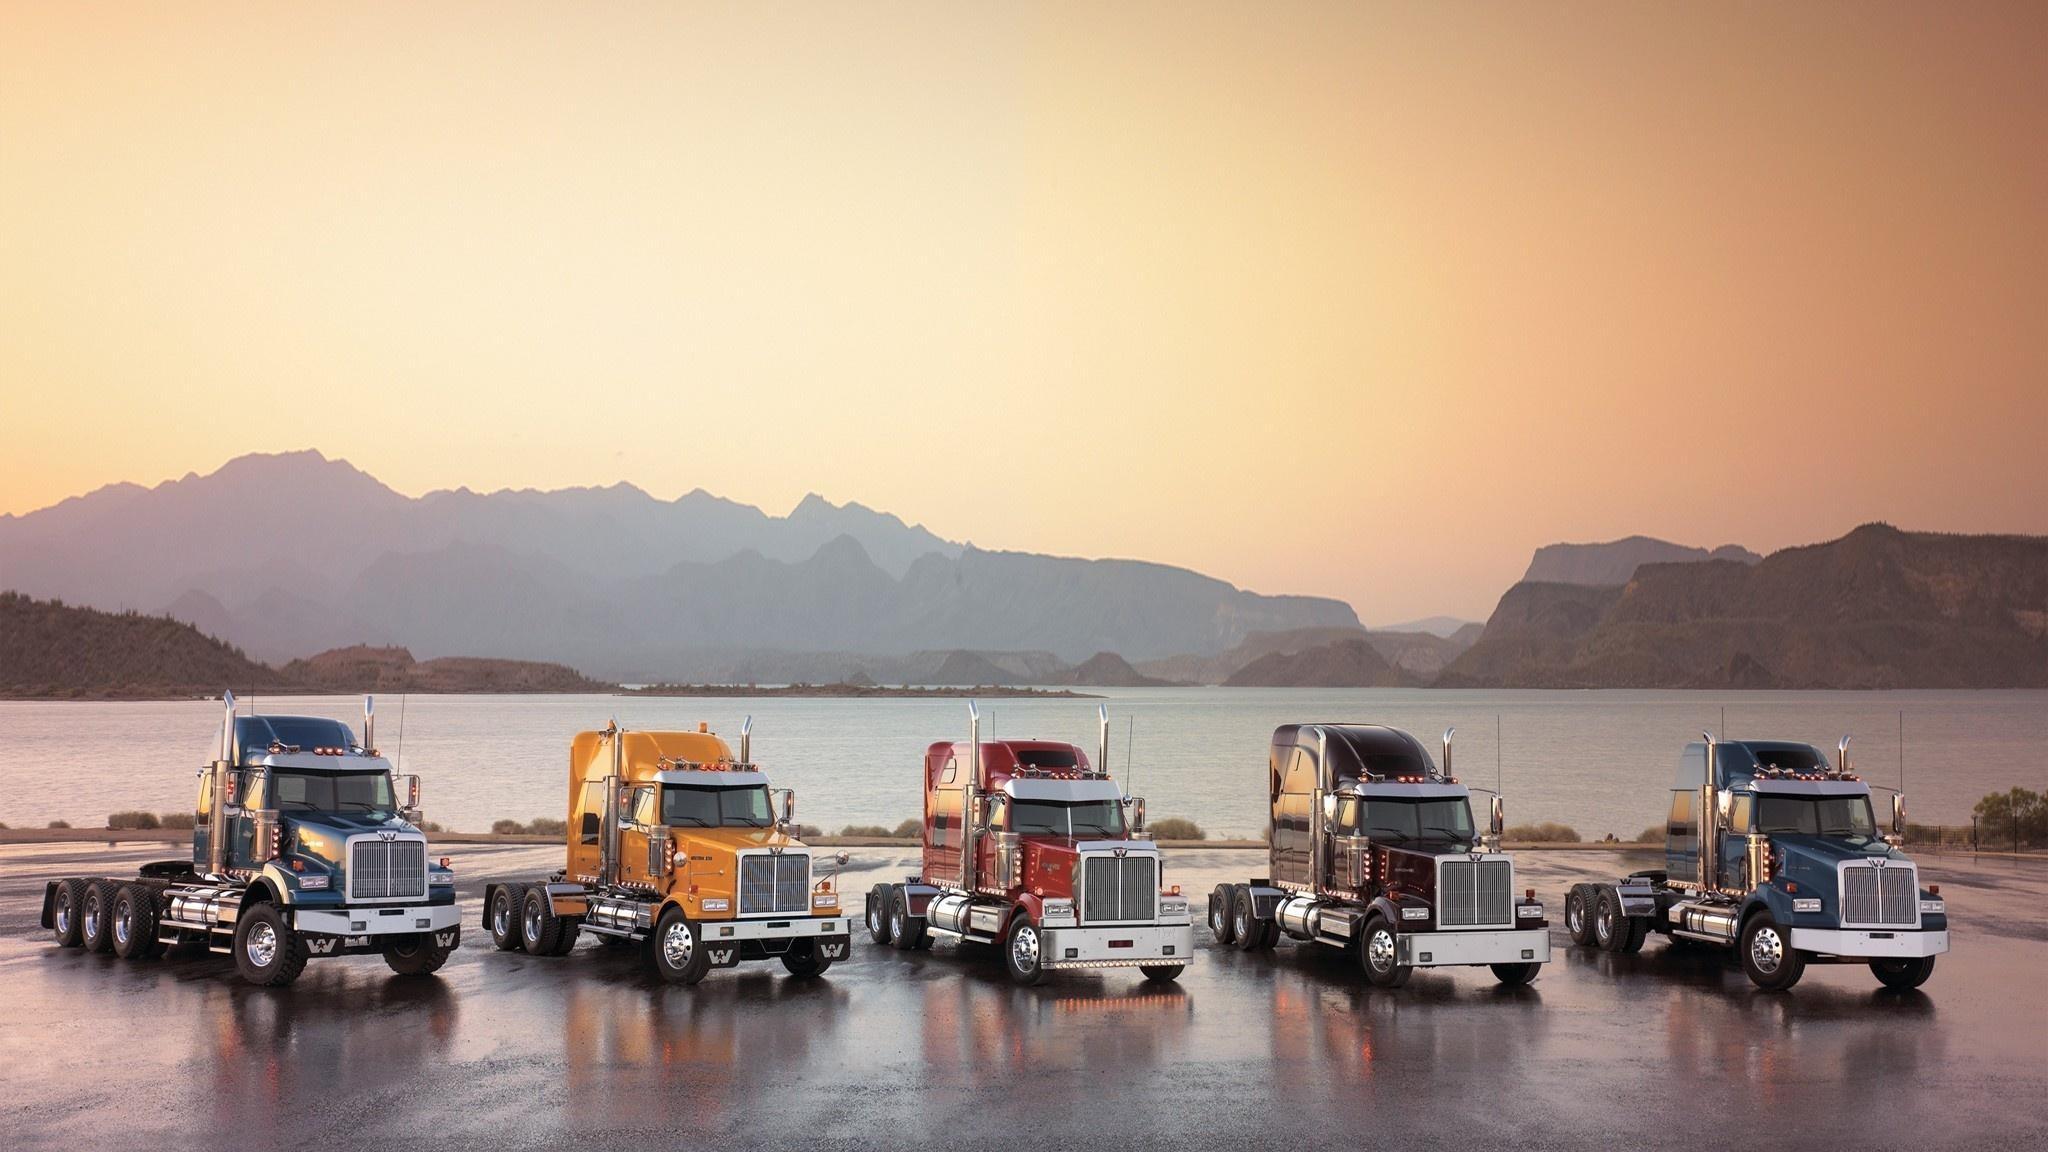 … cool semi truck wallpaper · Download Image